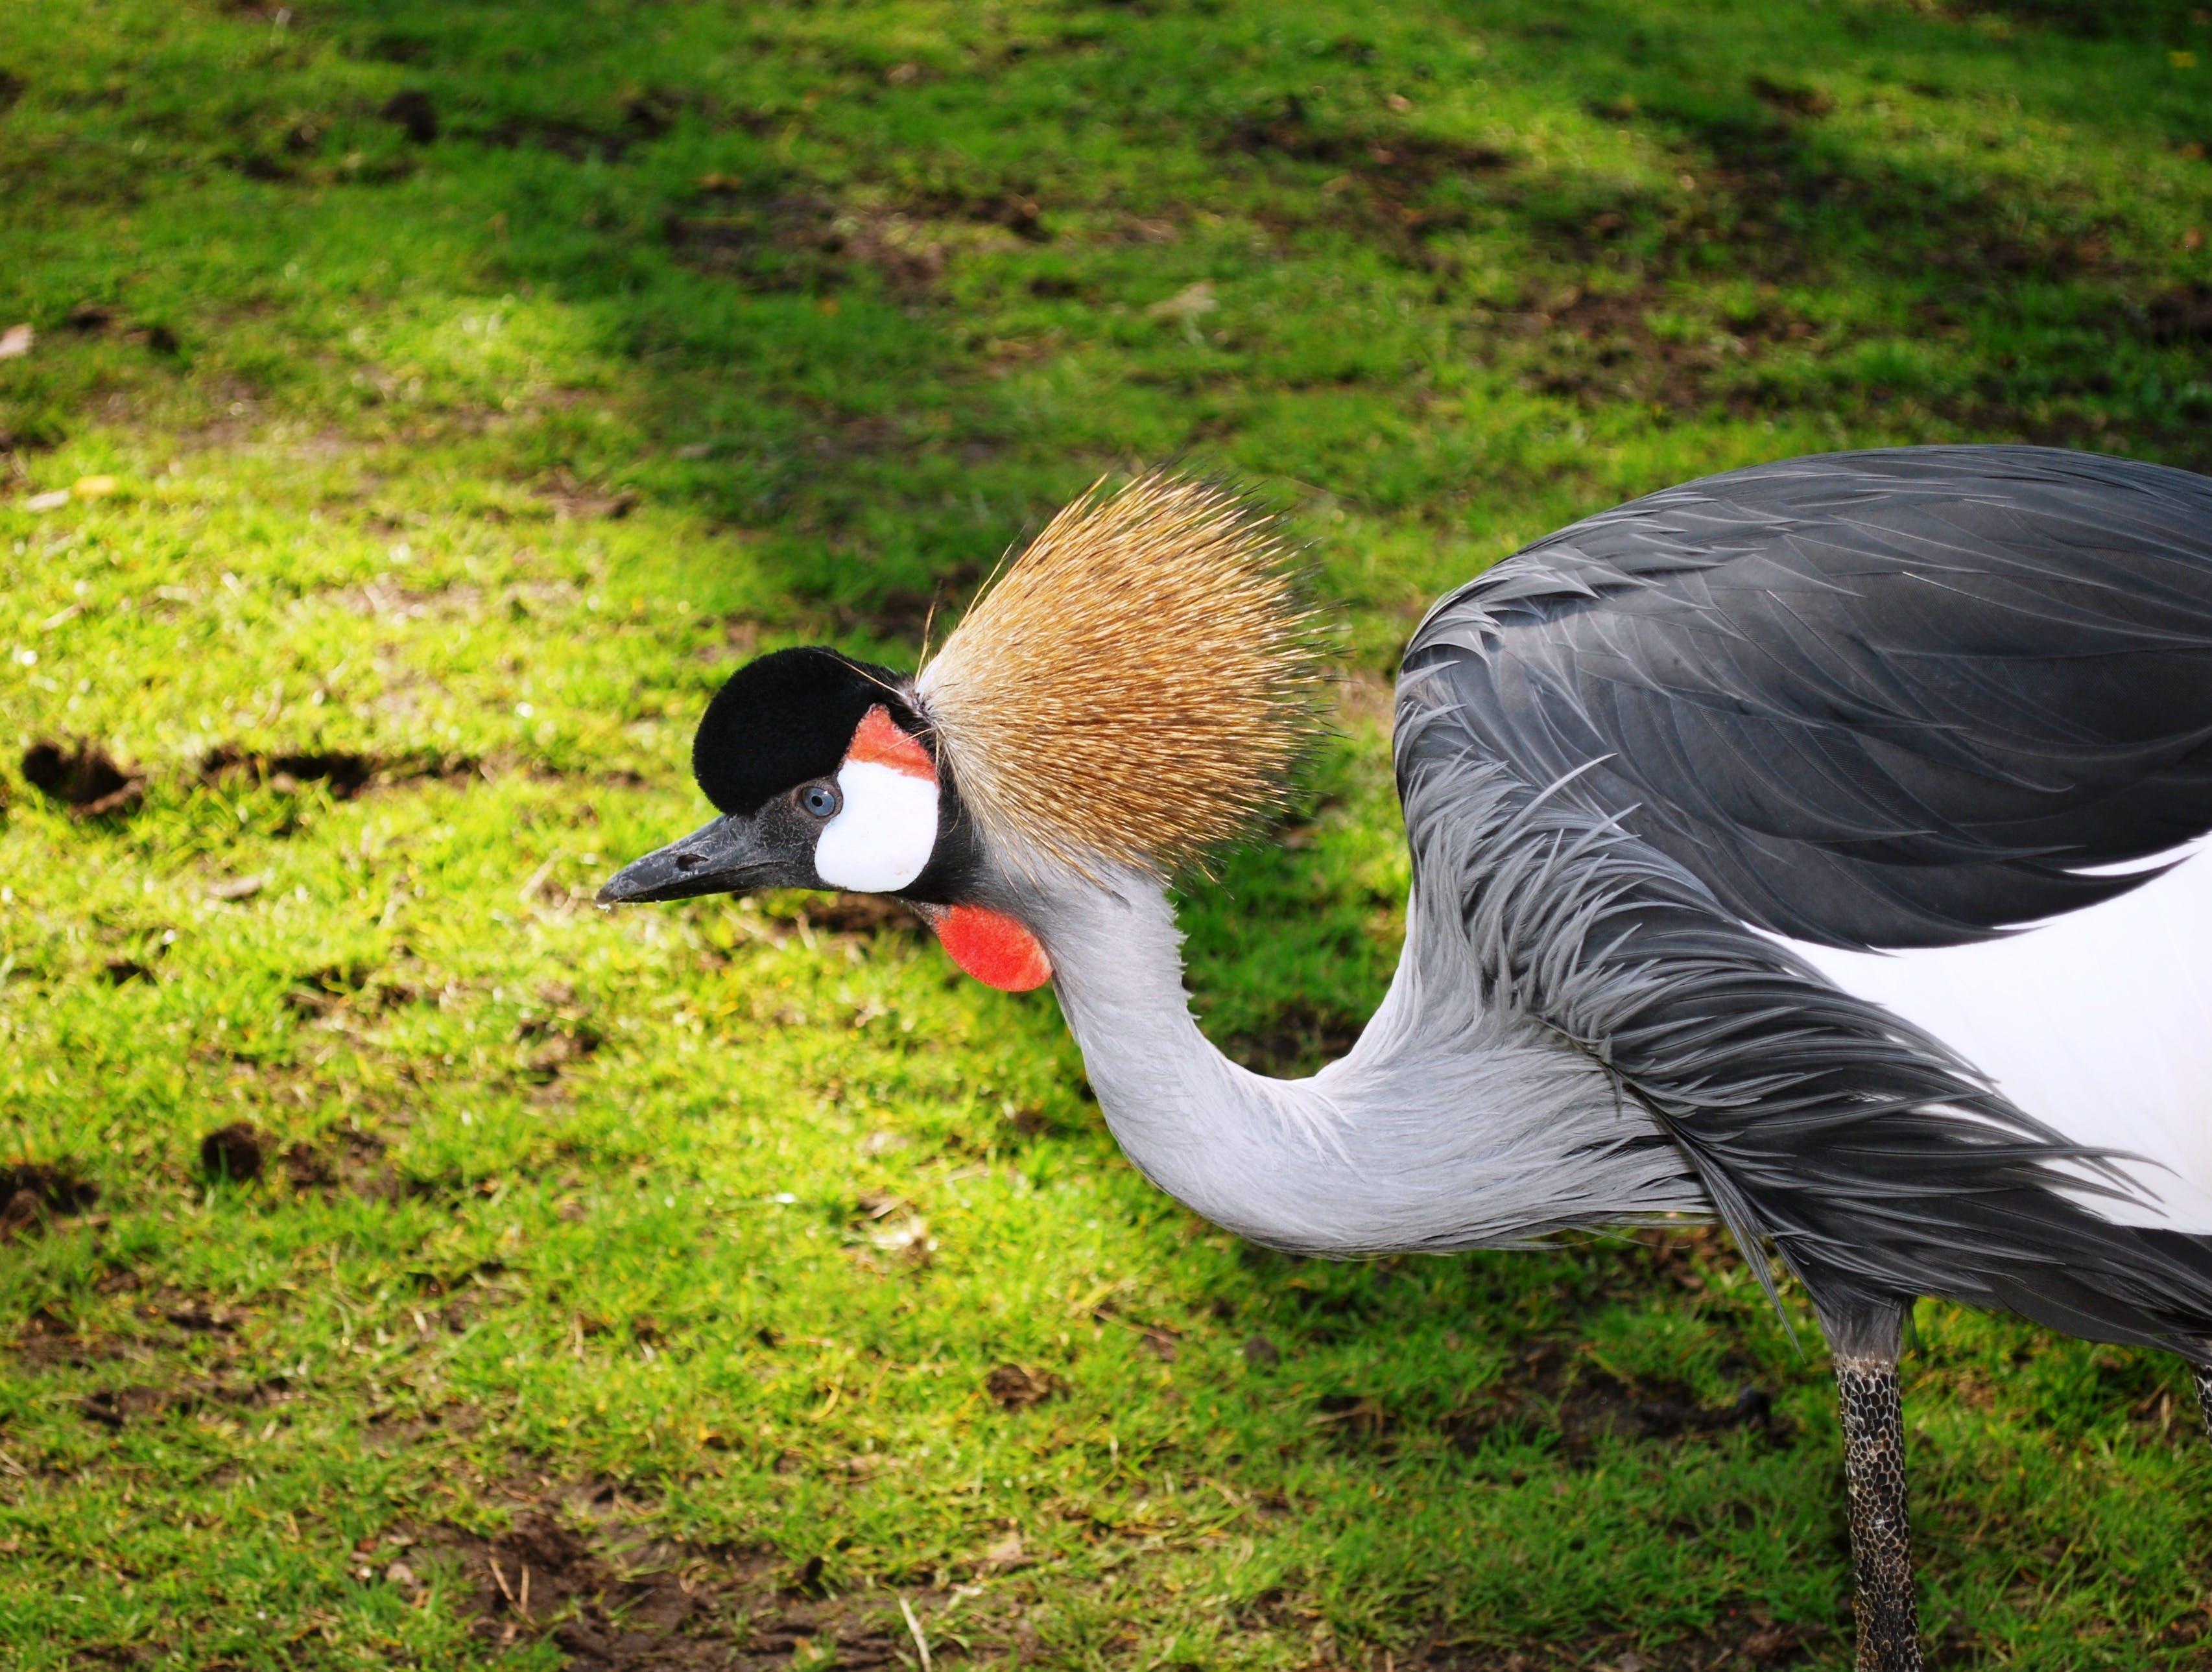 Black White and Gray Bird on Green Grass